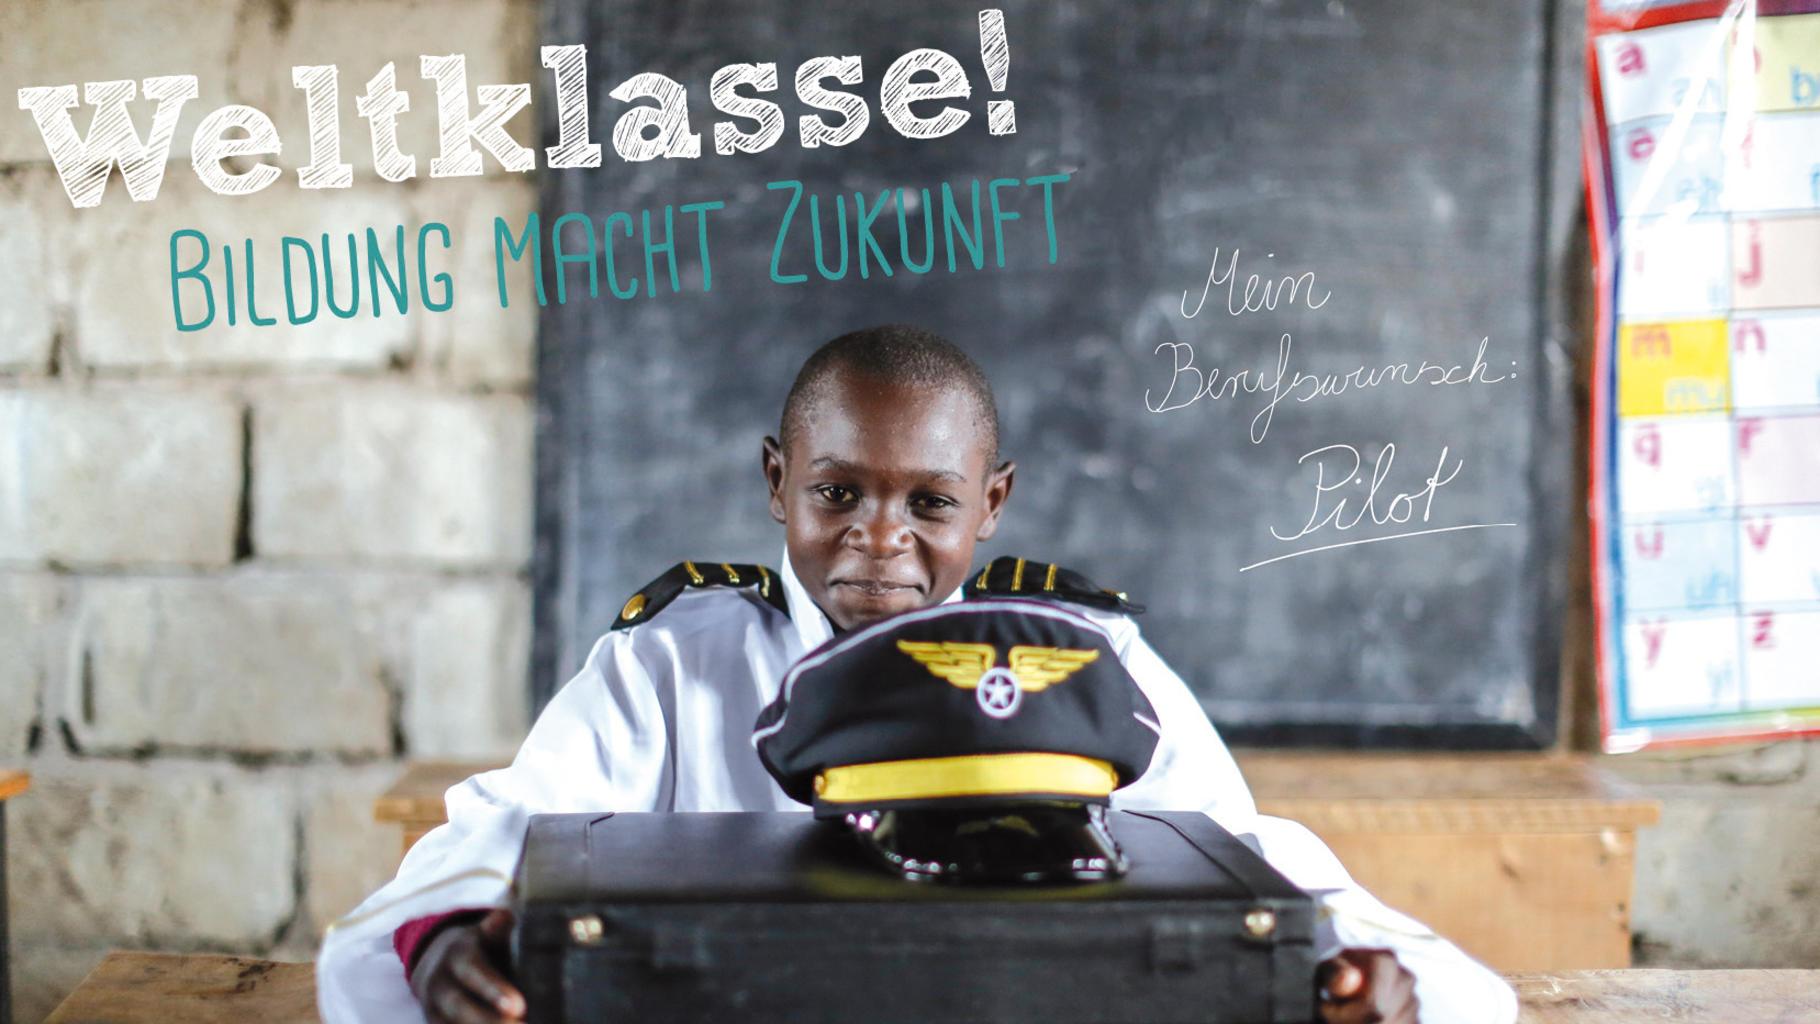 Weltklasse! Bildung macht Zukunft